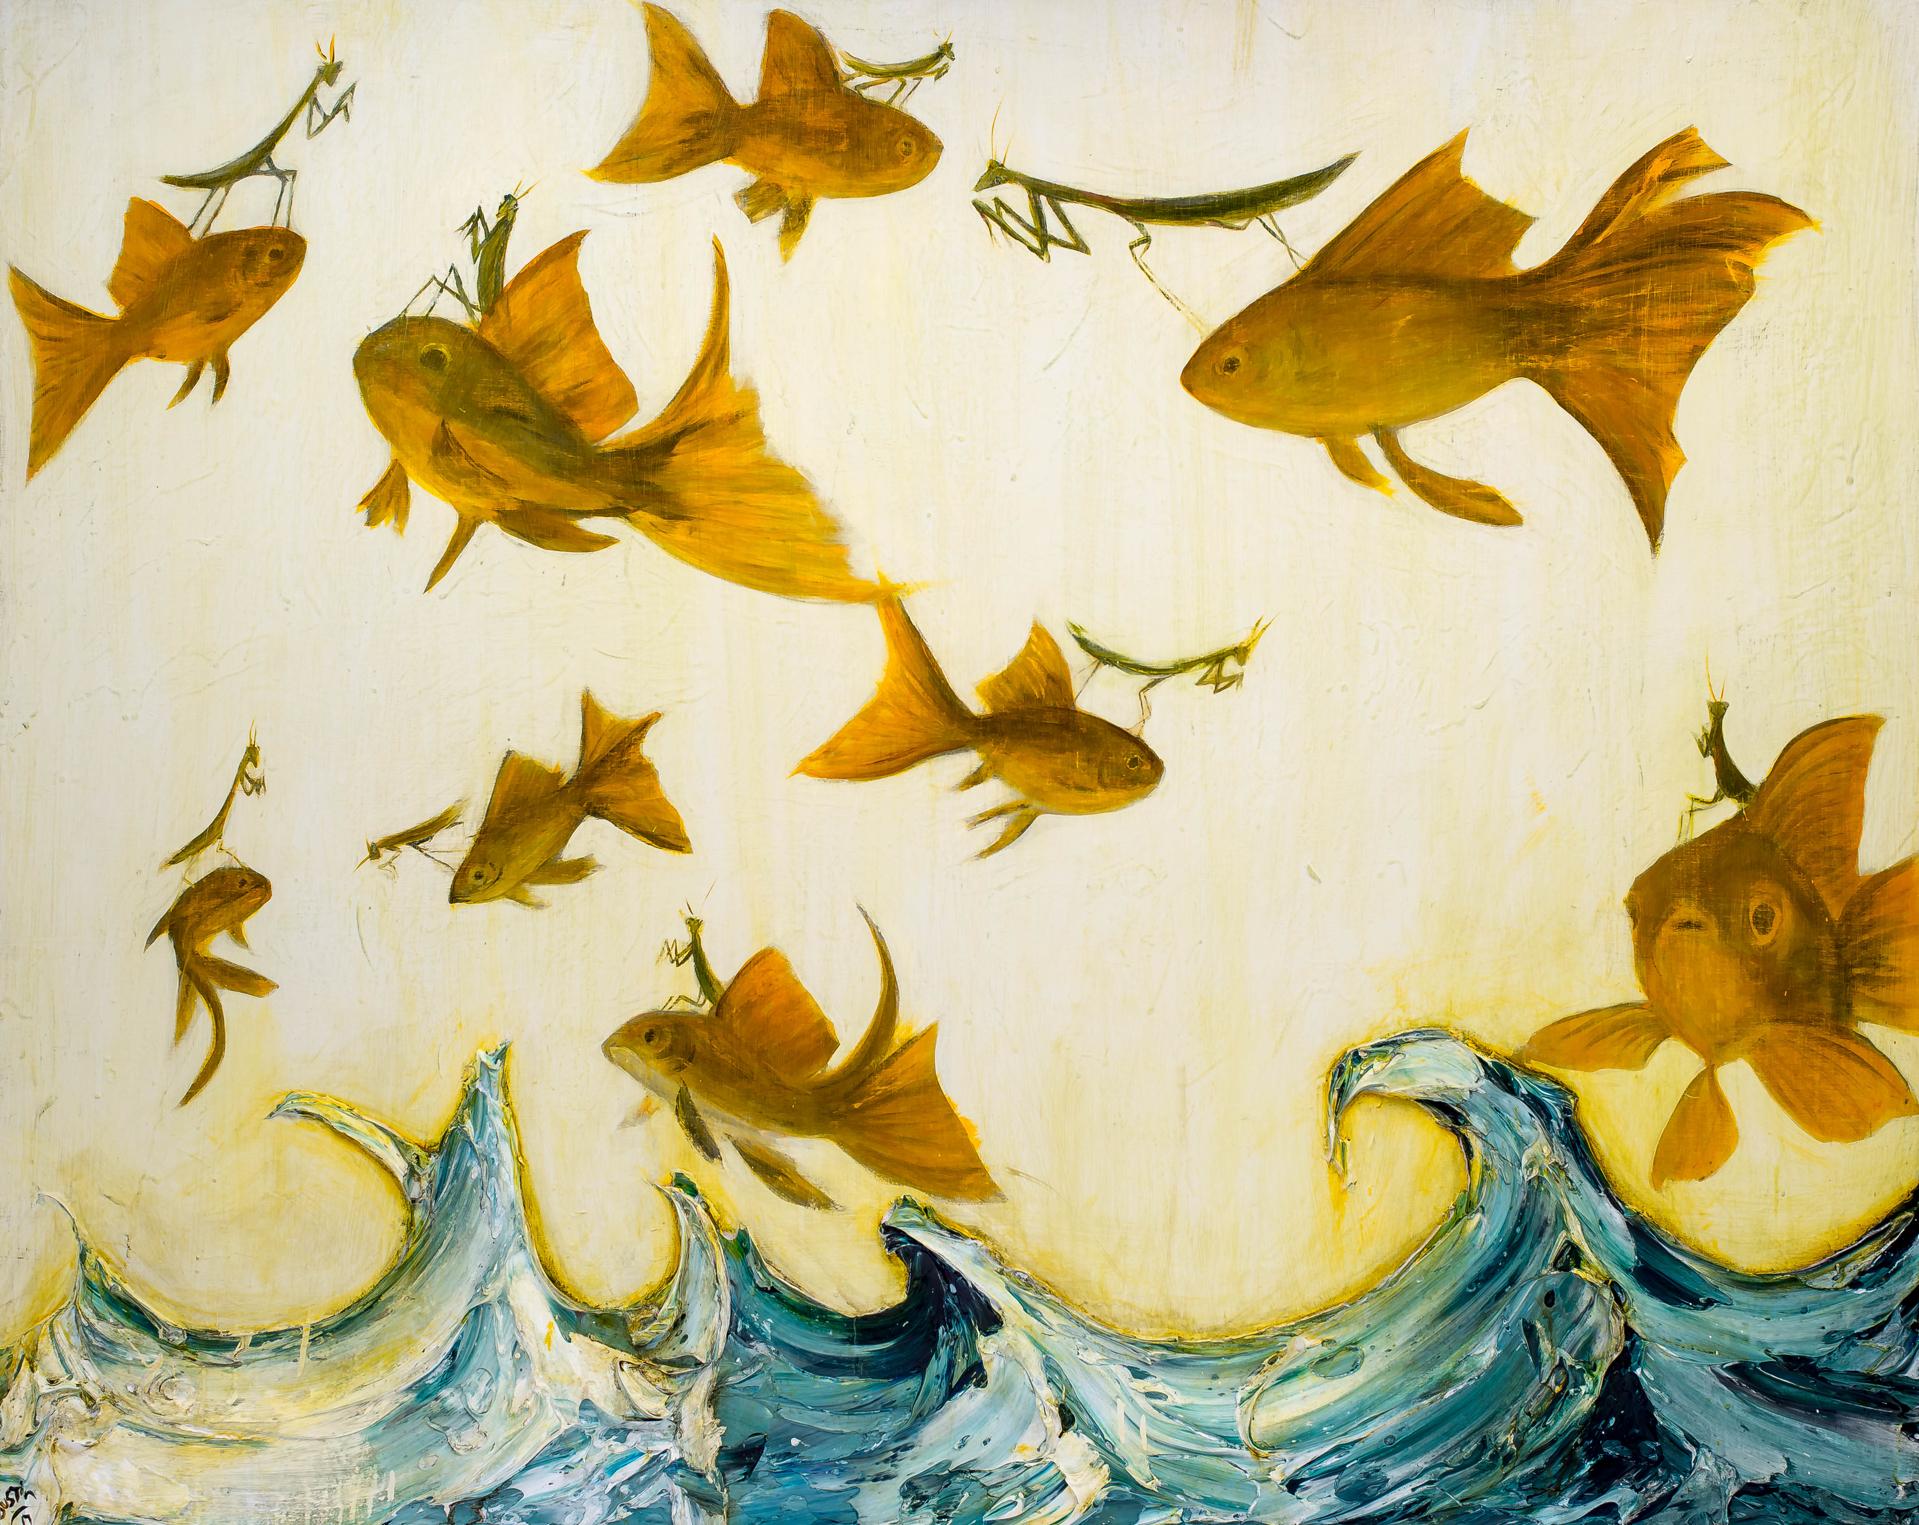 Gold Fish Mantises War by JUSTIN GAFFREY